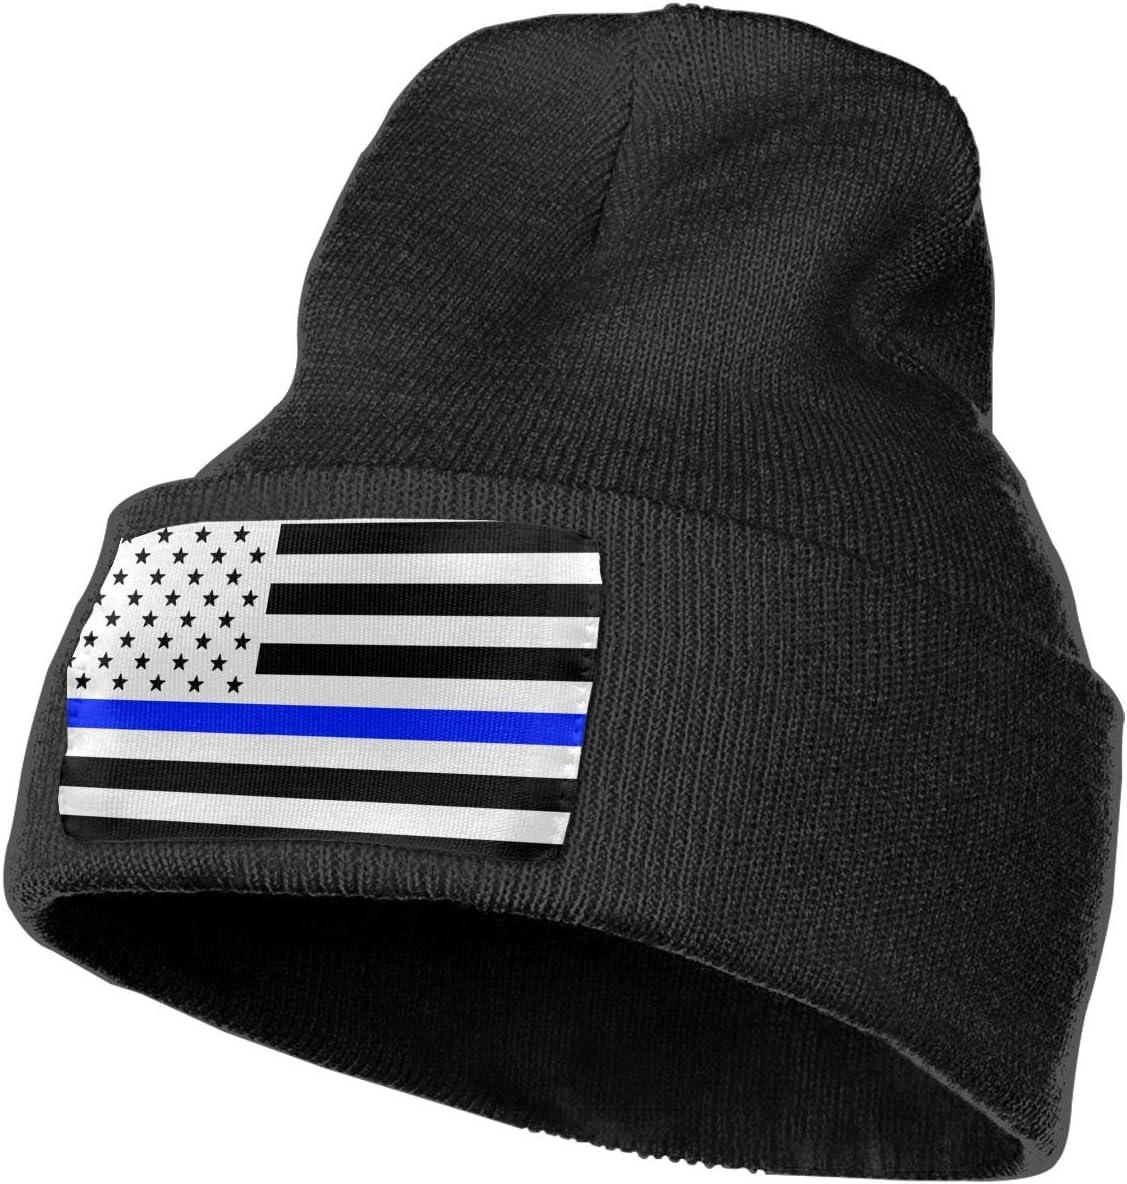 Thin Blue Line American Flag Men/&Women Warm Winter Knit Plain Beanie Hat Skull Cap Acrylic Knit Cuff Hat